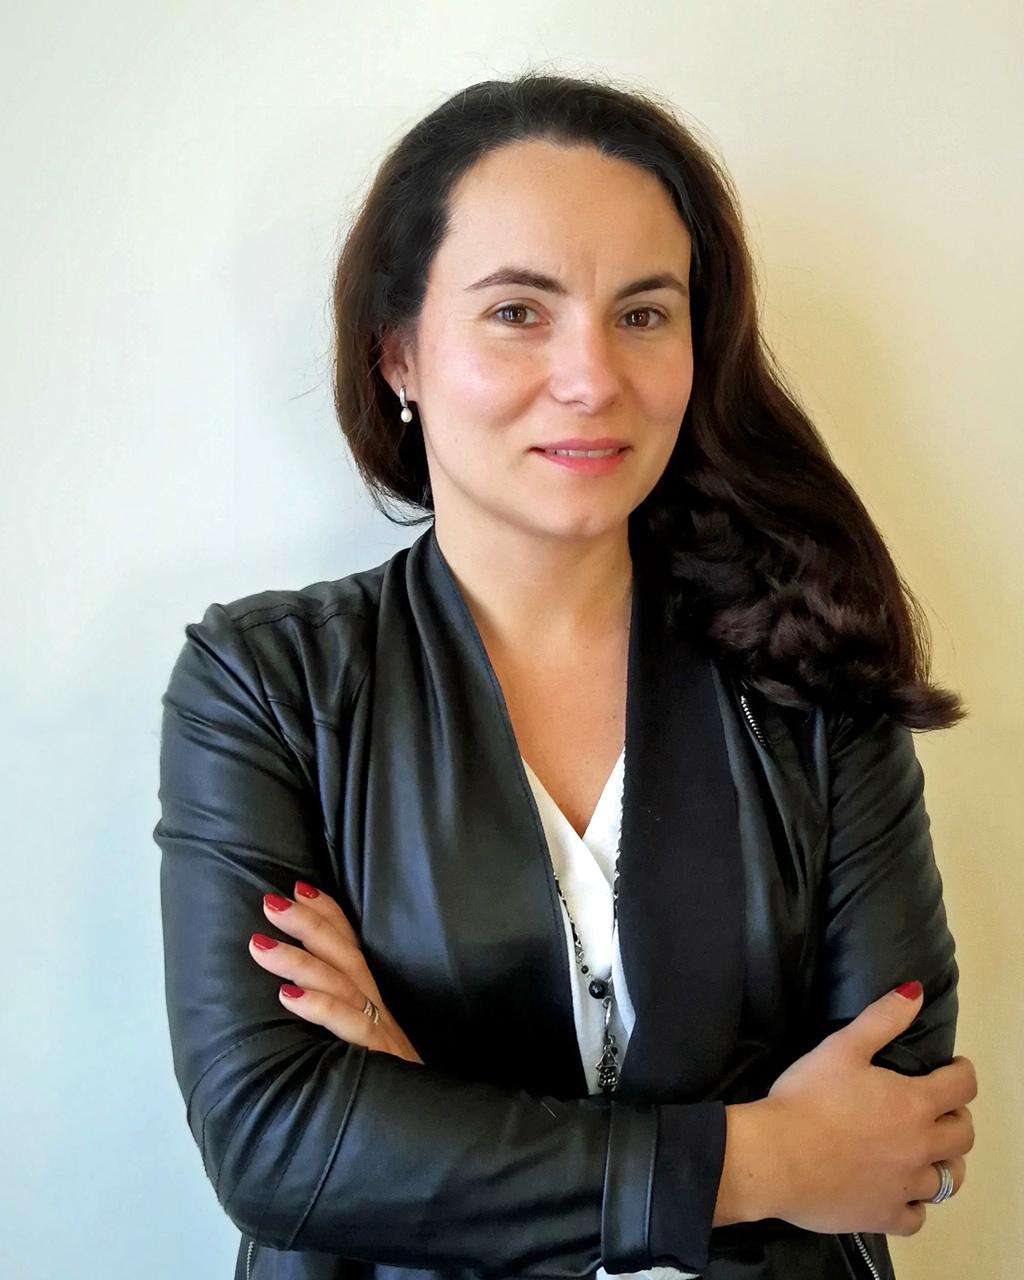 Tânia V. Silva